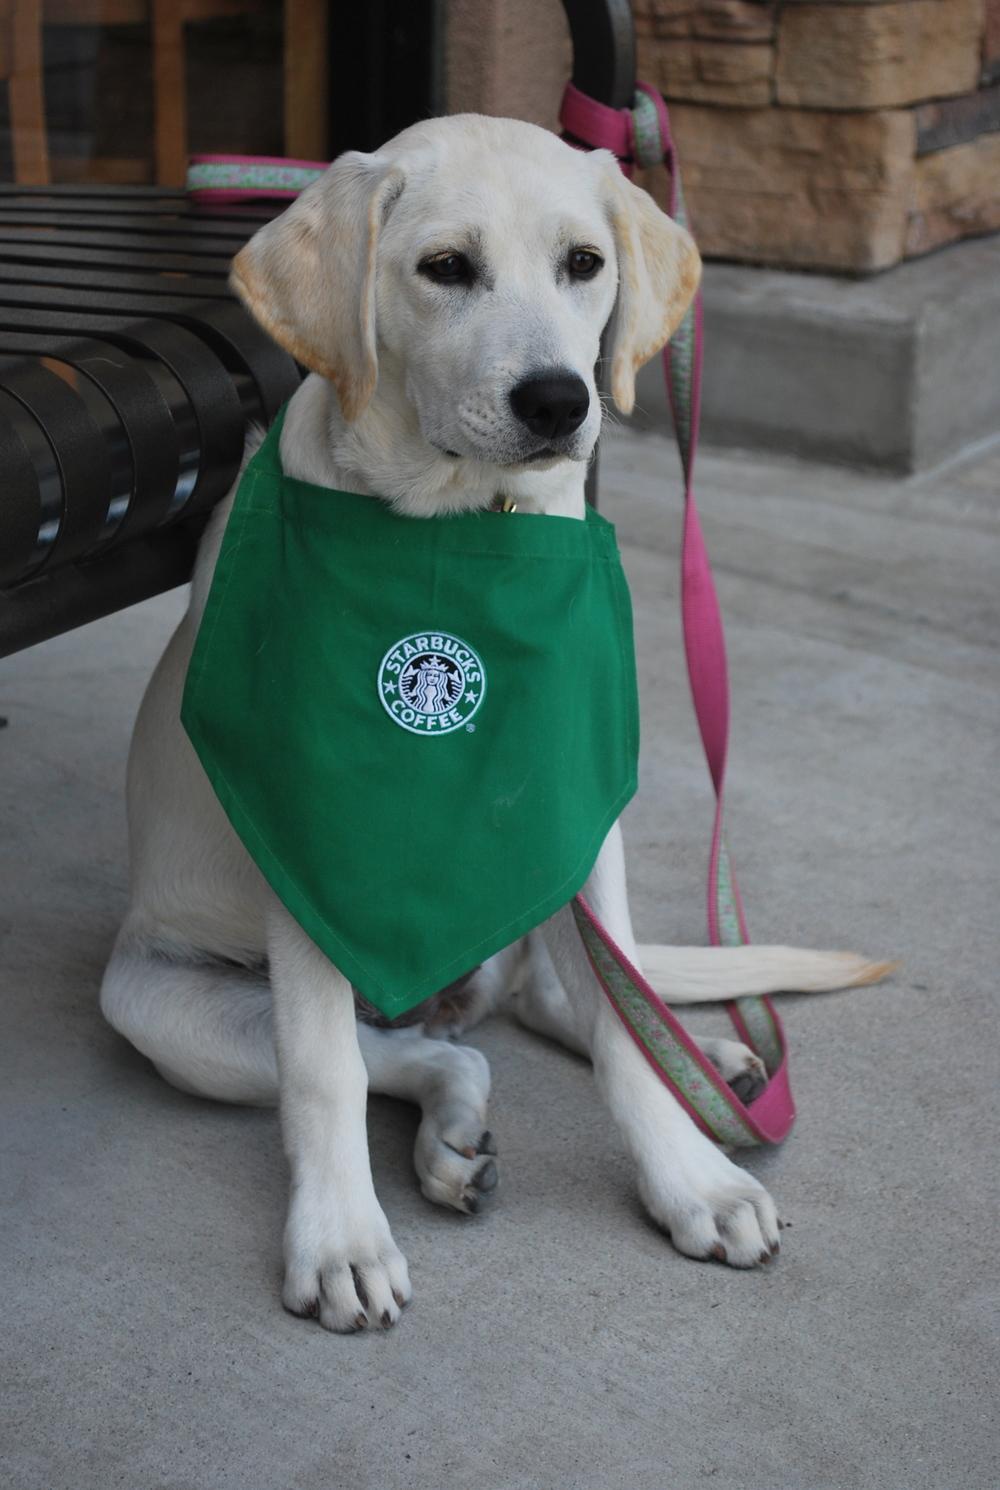 DSC_0176-1-Morgan-in-Moreno-Valley-Starbucks.jpg